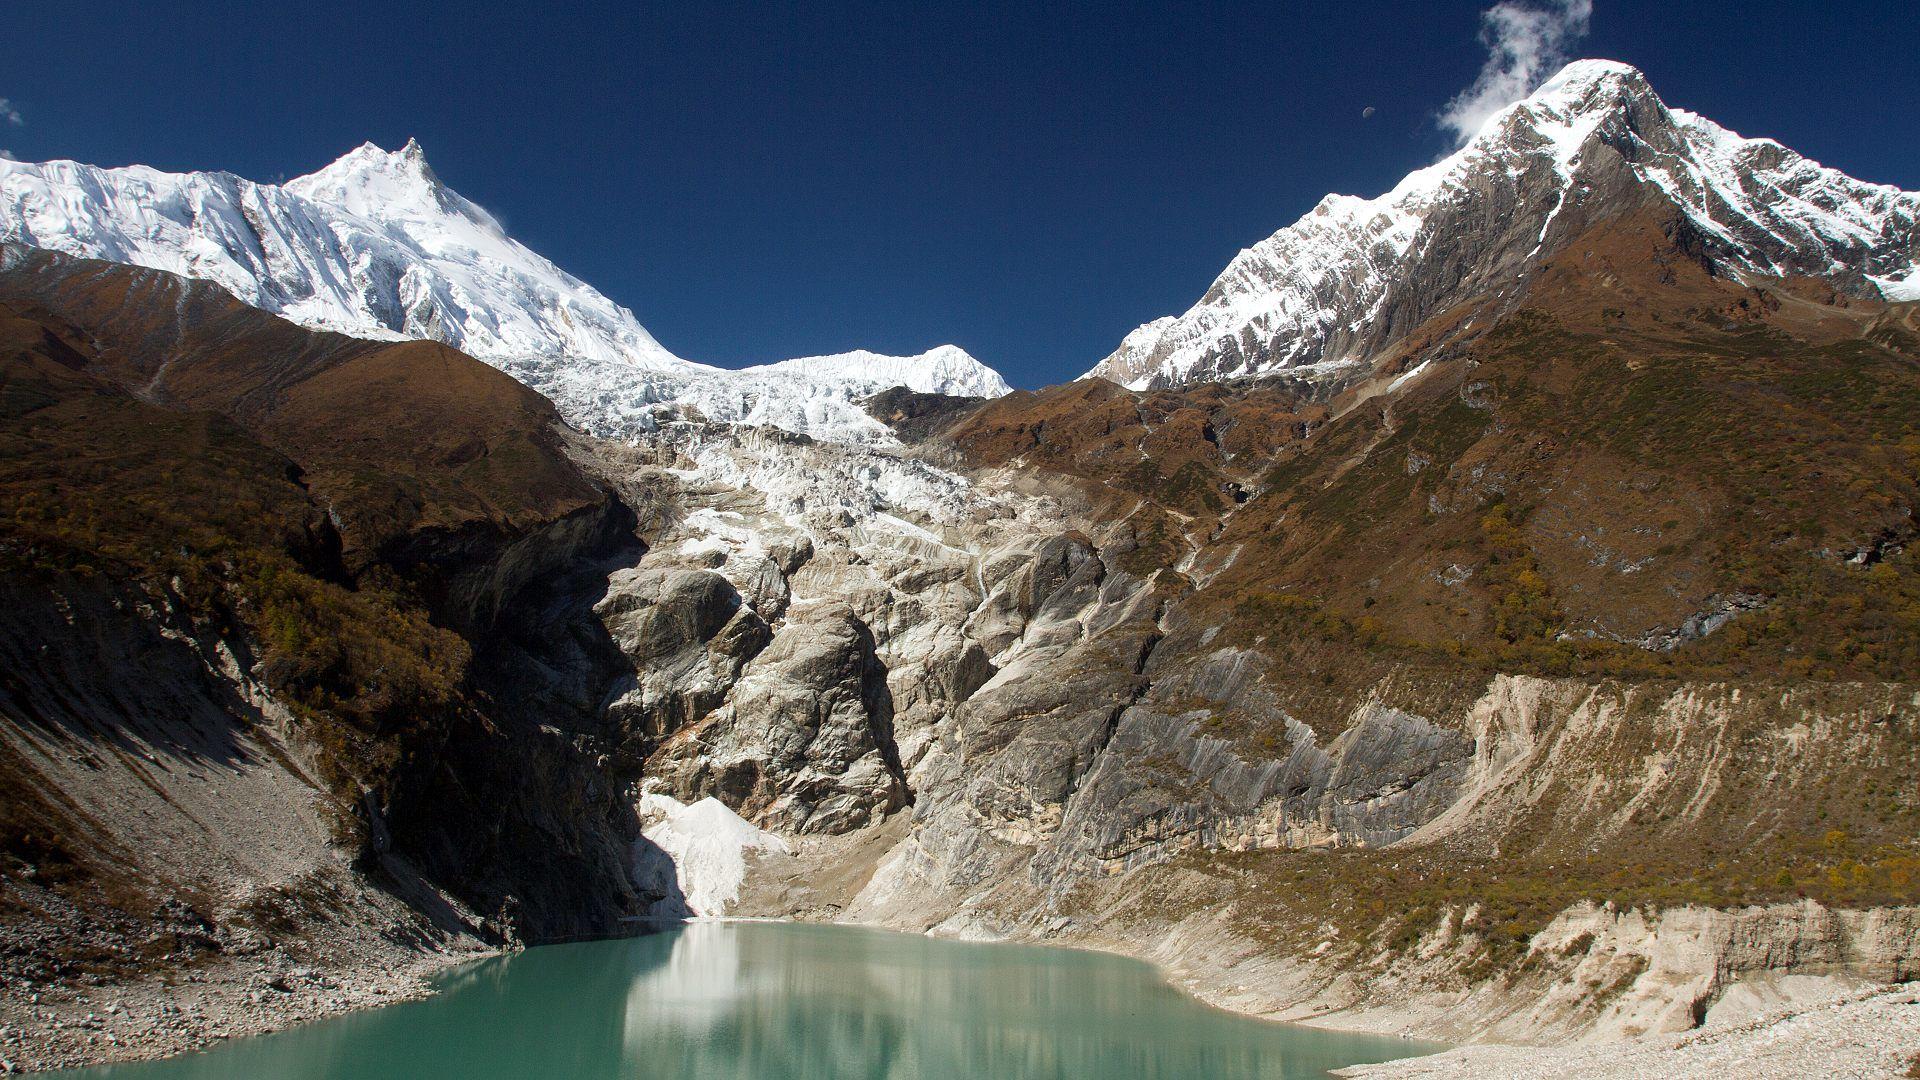 Nepál - trek kolem bájné Manaslu - zájezd  f33d7a71ffb